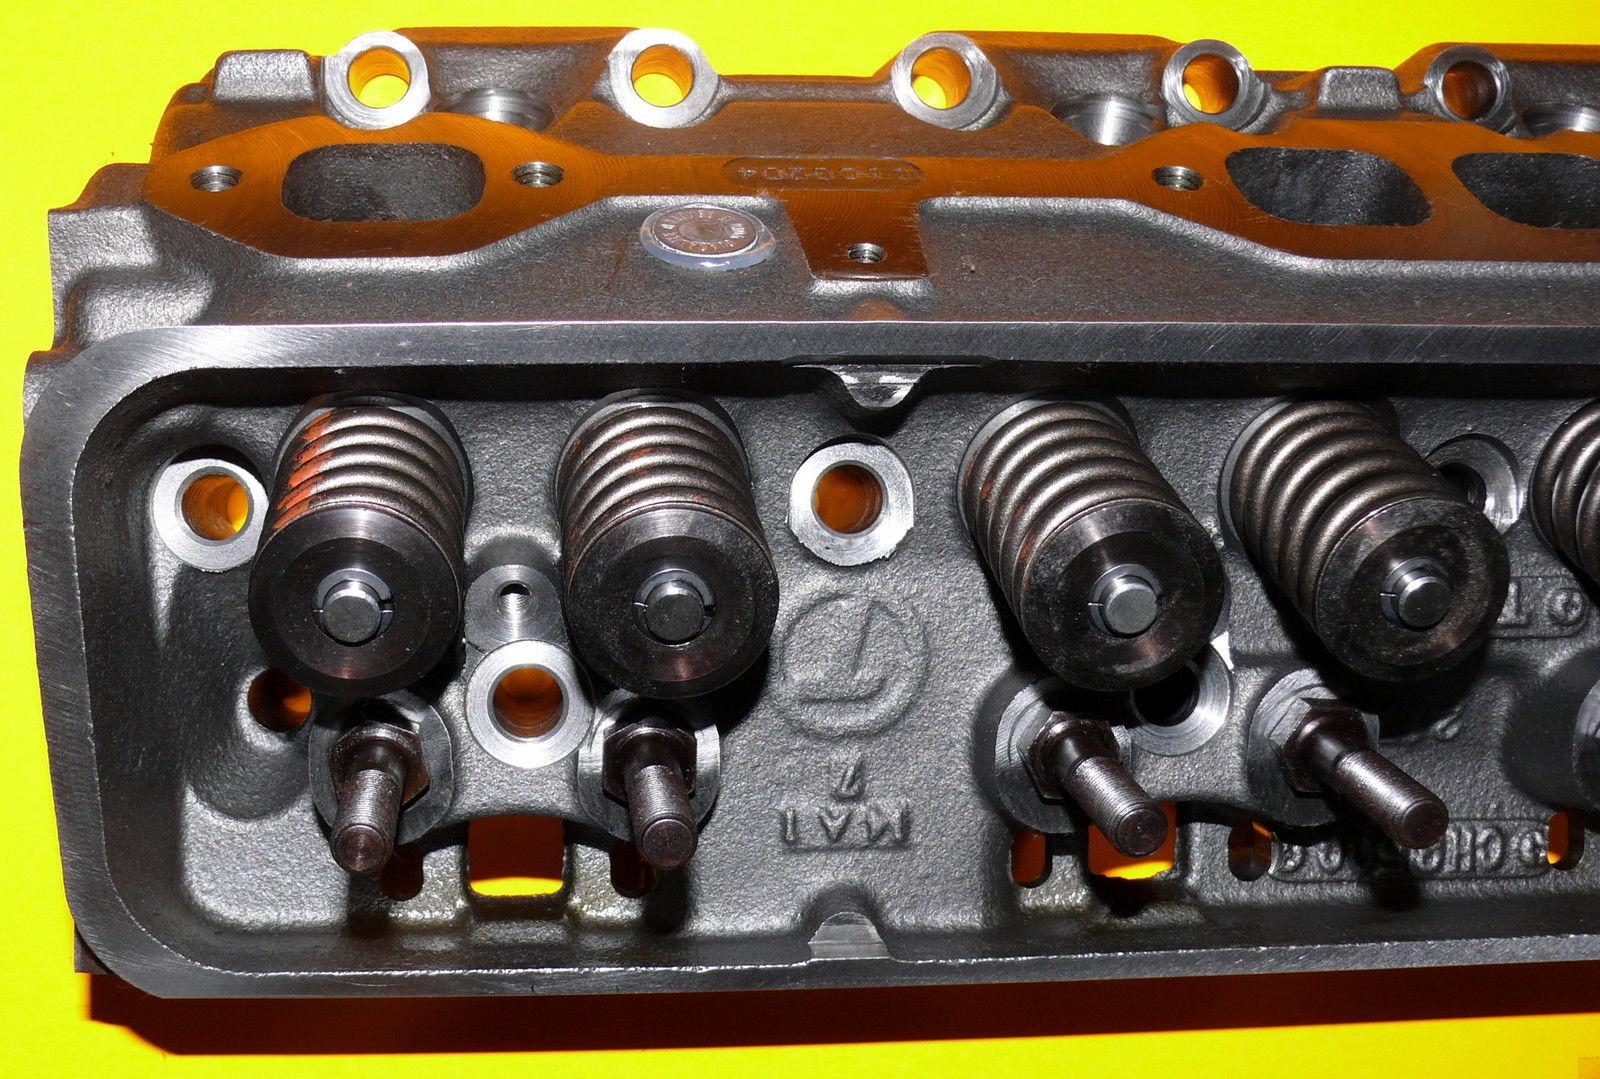 ENGINEQUEST CHEVY 305 350 MARINE INTAKE MANIFOLD CAST IRON 87-95